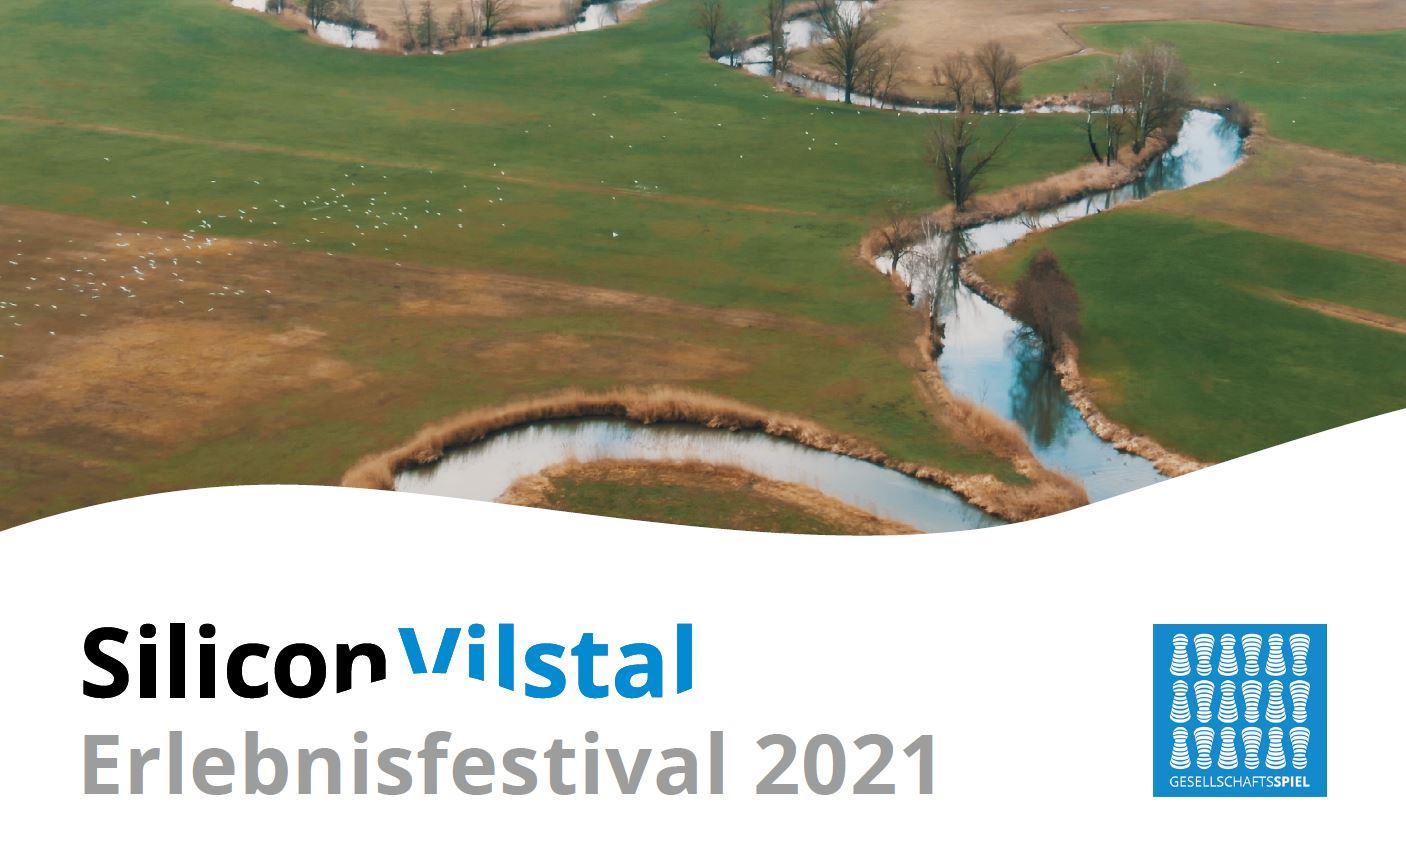 Silicon Vilstal Erlebnisfestival 2021